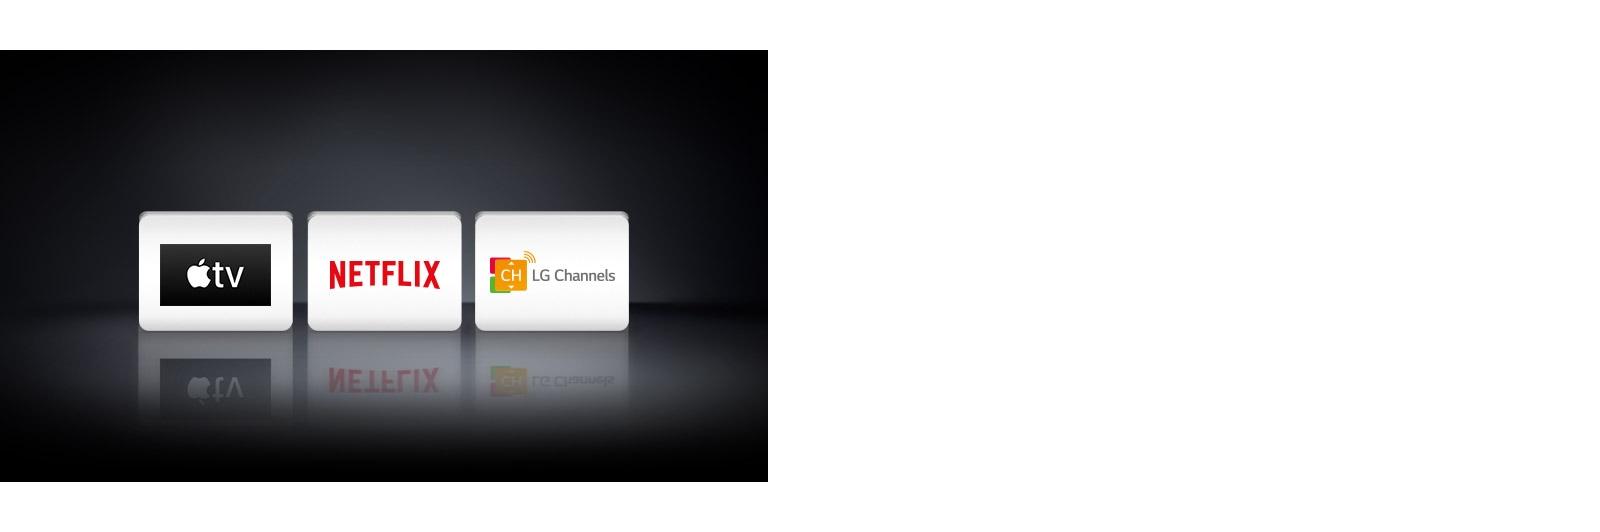 Three logos: The Apple TV app, Netflix and LG Channels